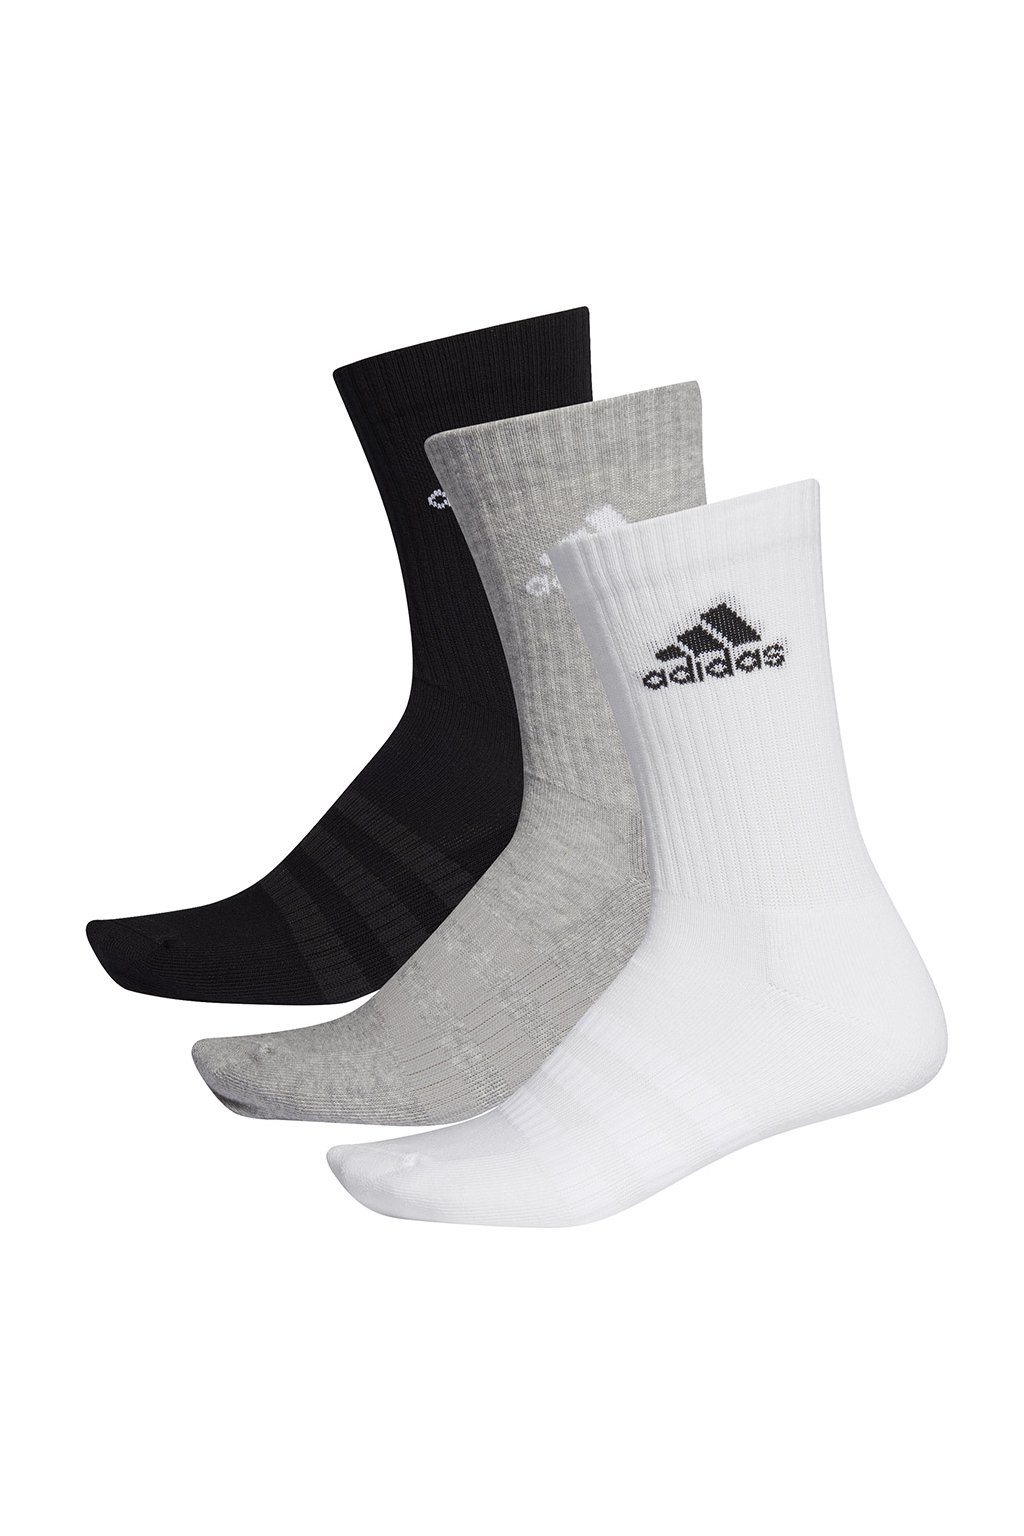 Ponožky Adidas Cushlined Crew 3PP čierne, biele, sivé DZ9355